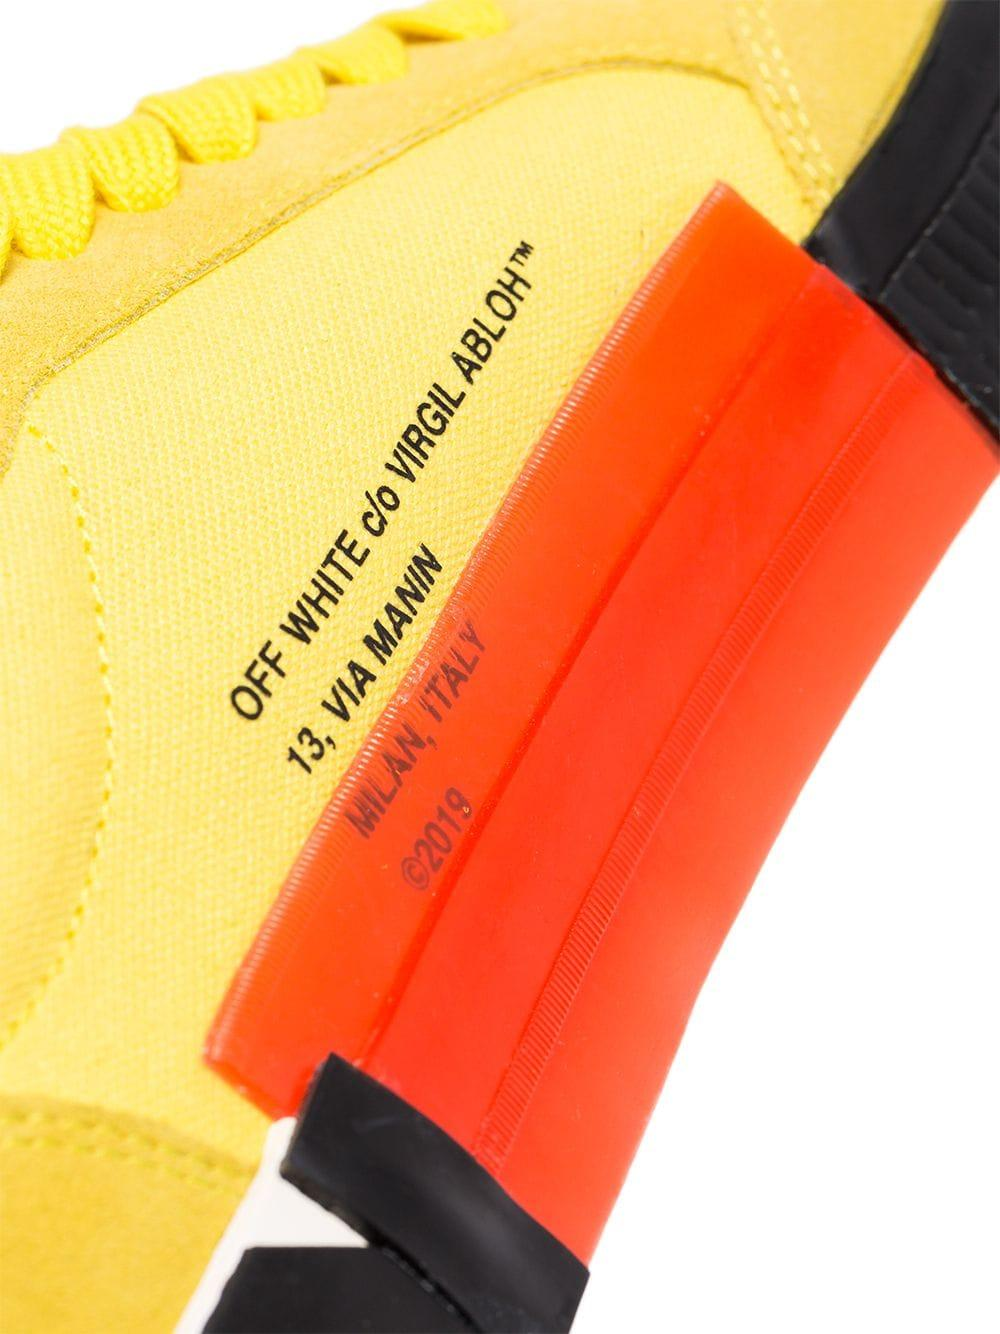 Off-White c/o Virgil Abloh Suède Vulcanized Sneakers in het Geel voor heren